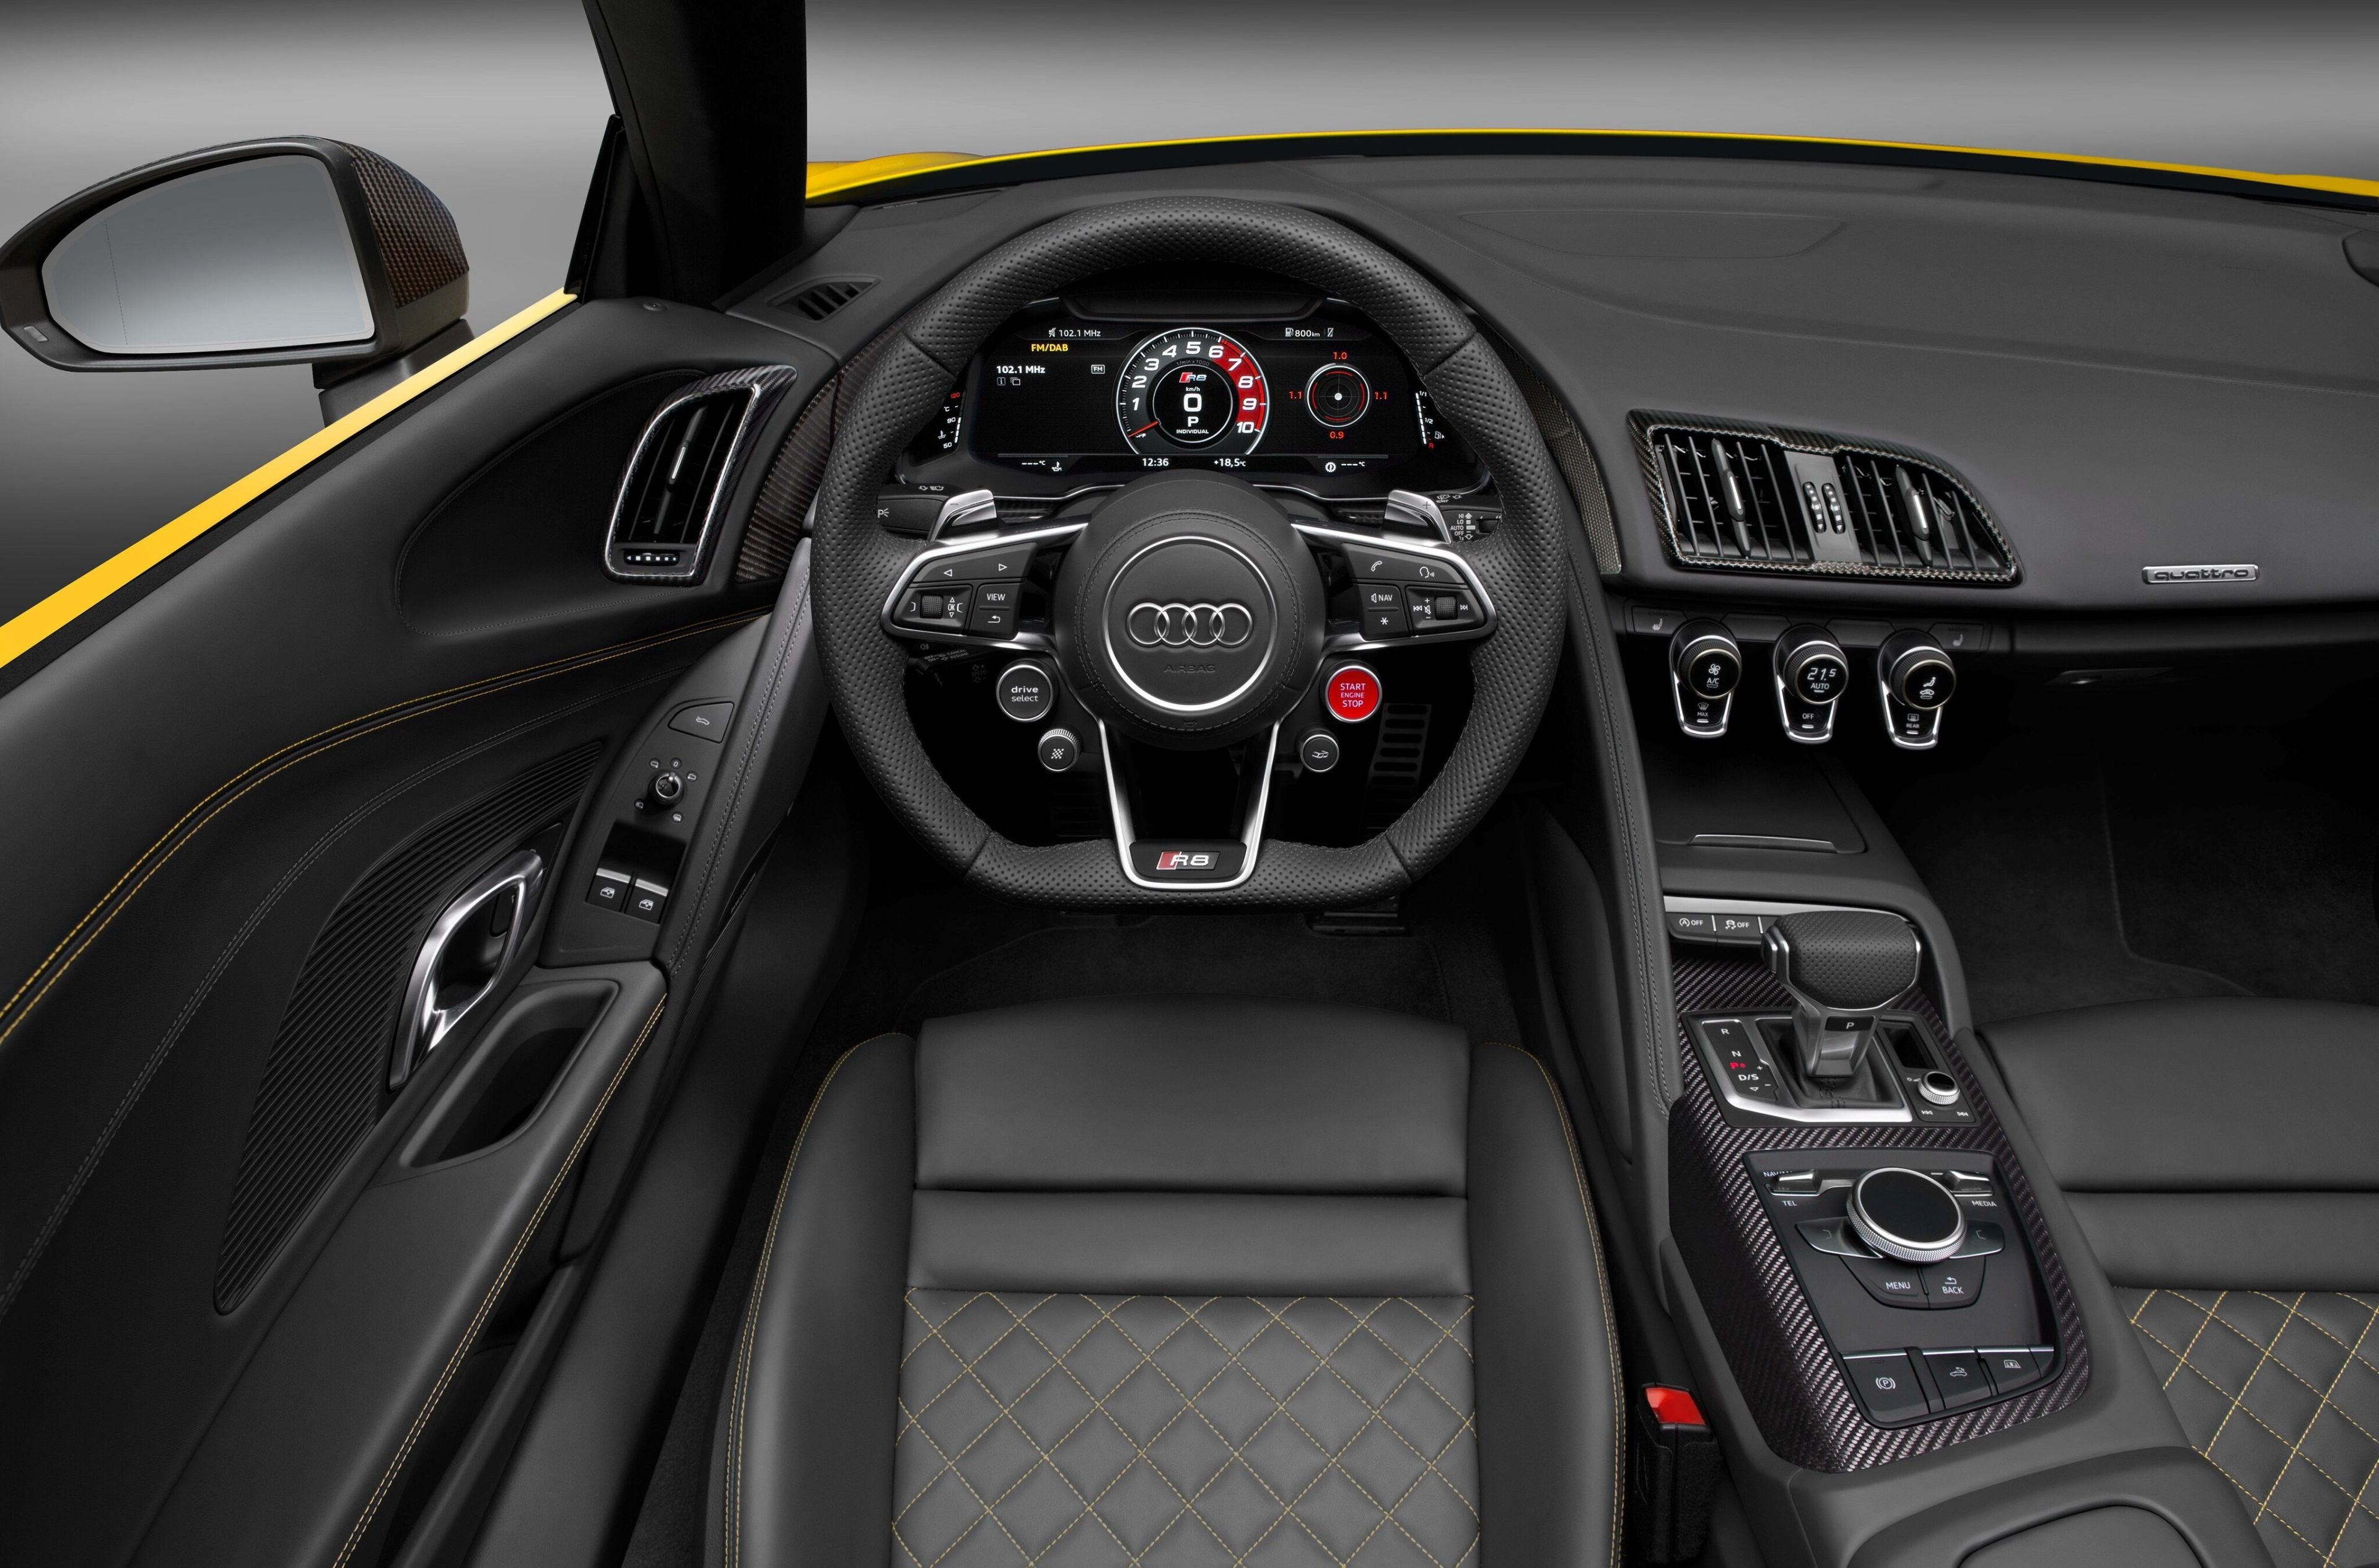 3840x2531 Audi R8 4k Macbook Wallpapers Hd Audi R8 Spyder R8 Spyder Audi R8